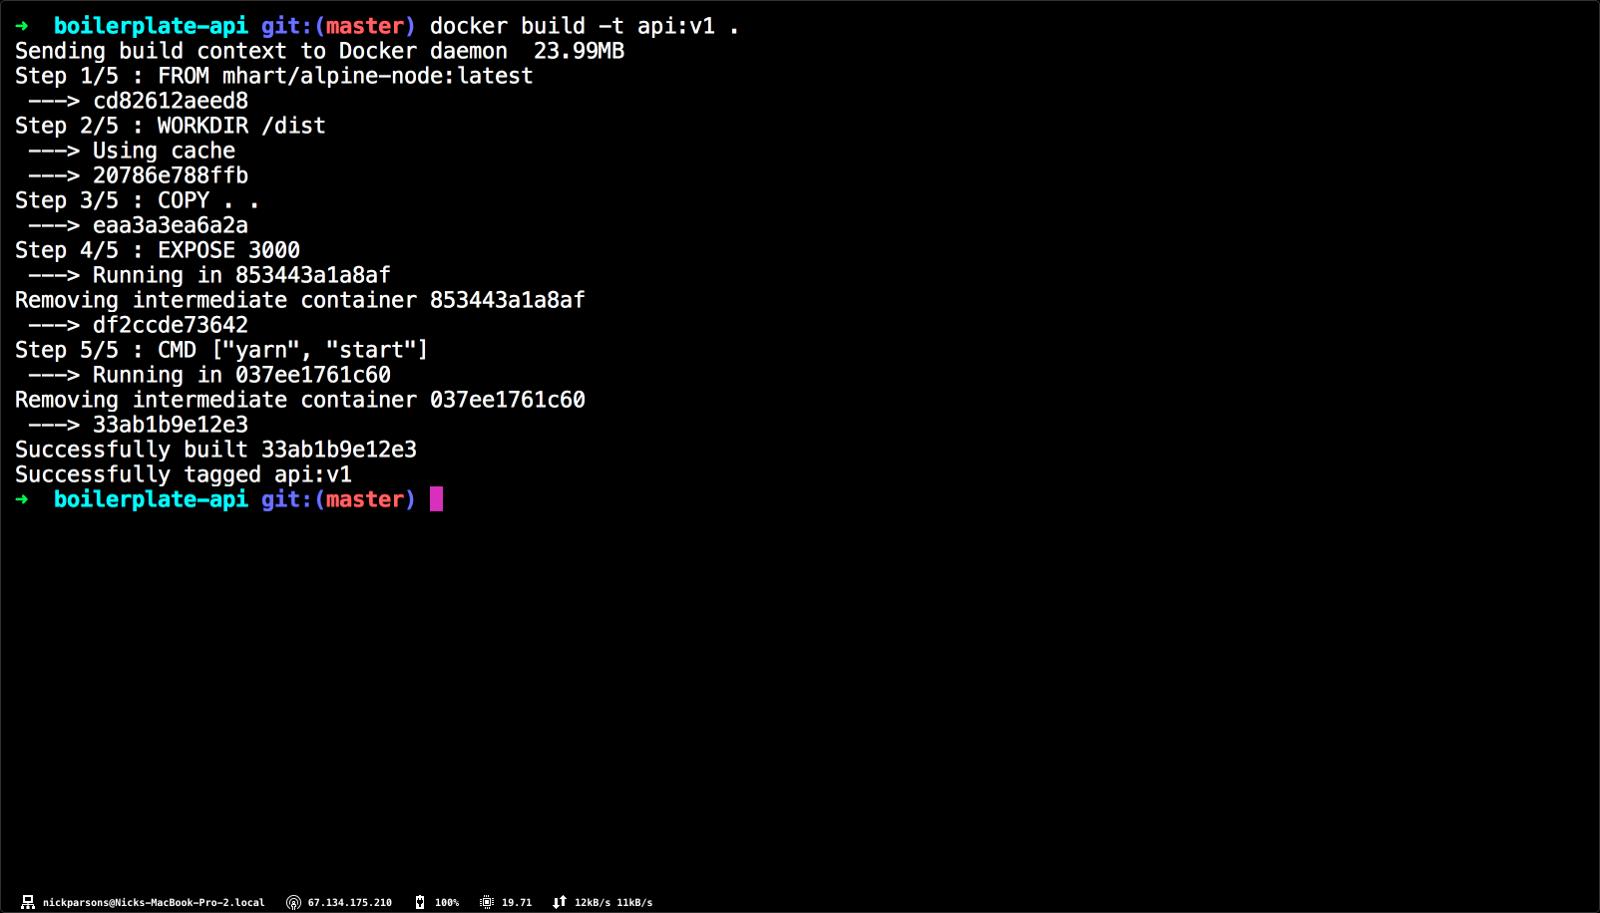 Containerizing a Node js API & Using Docker with Kubernetes